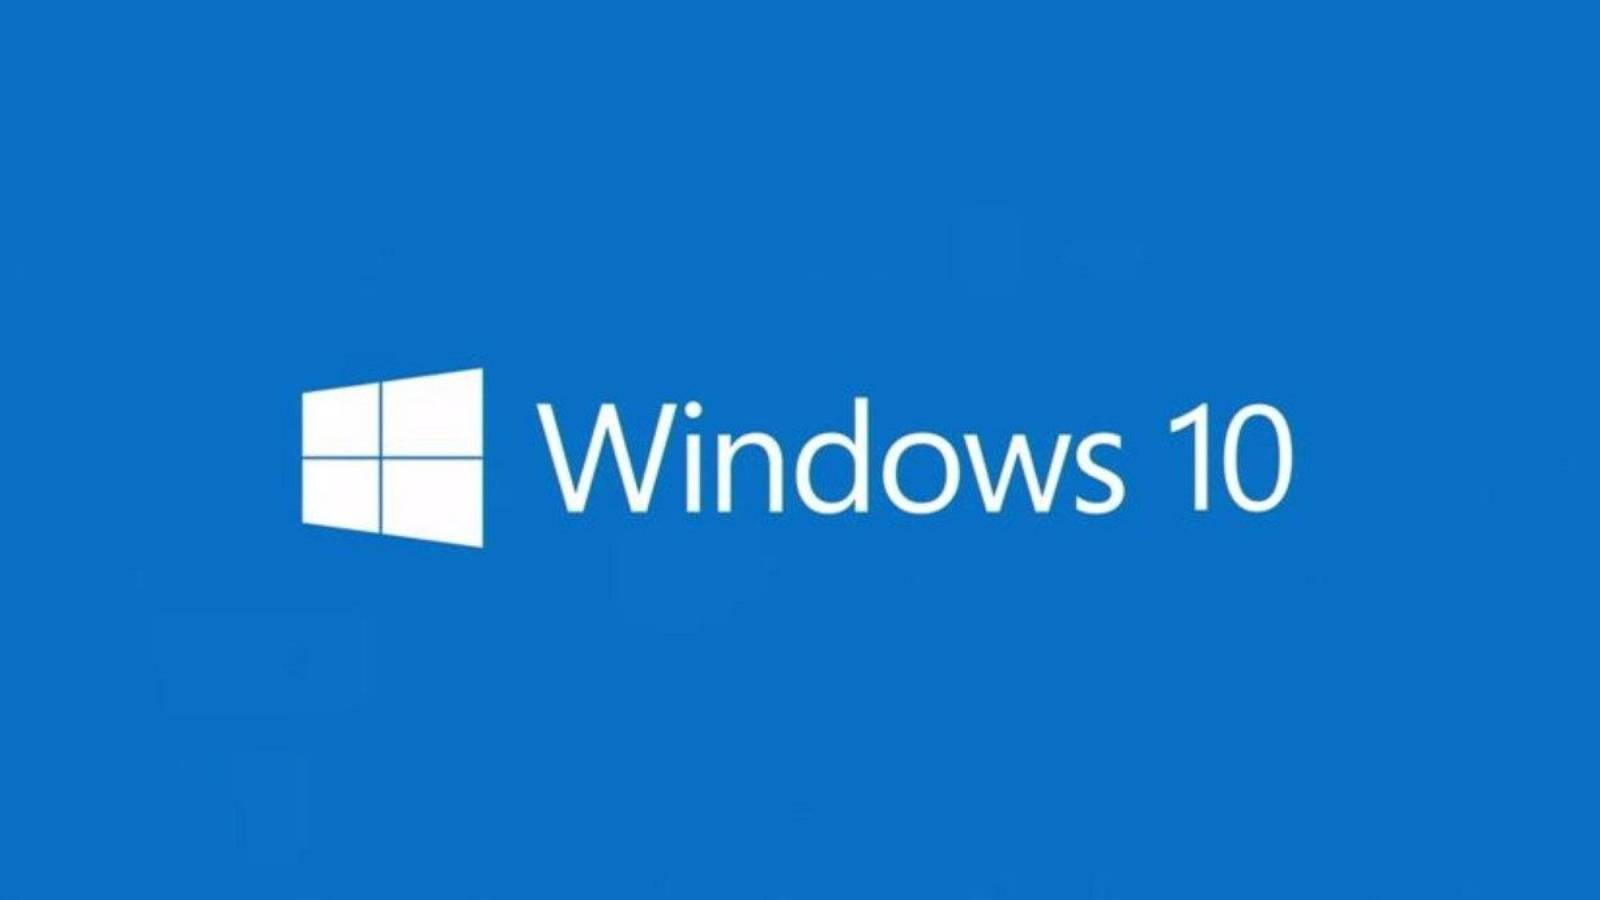 Windows 10 solutie